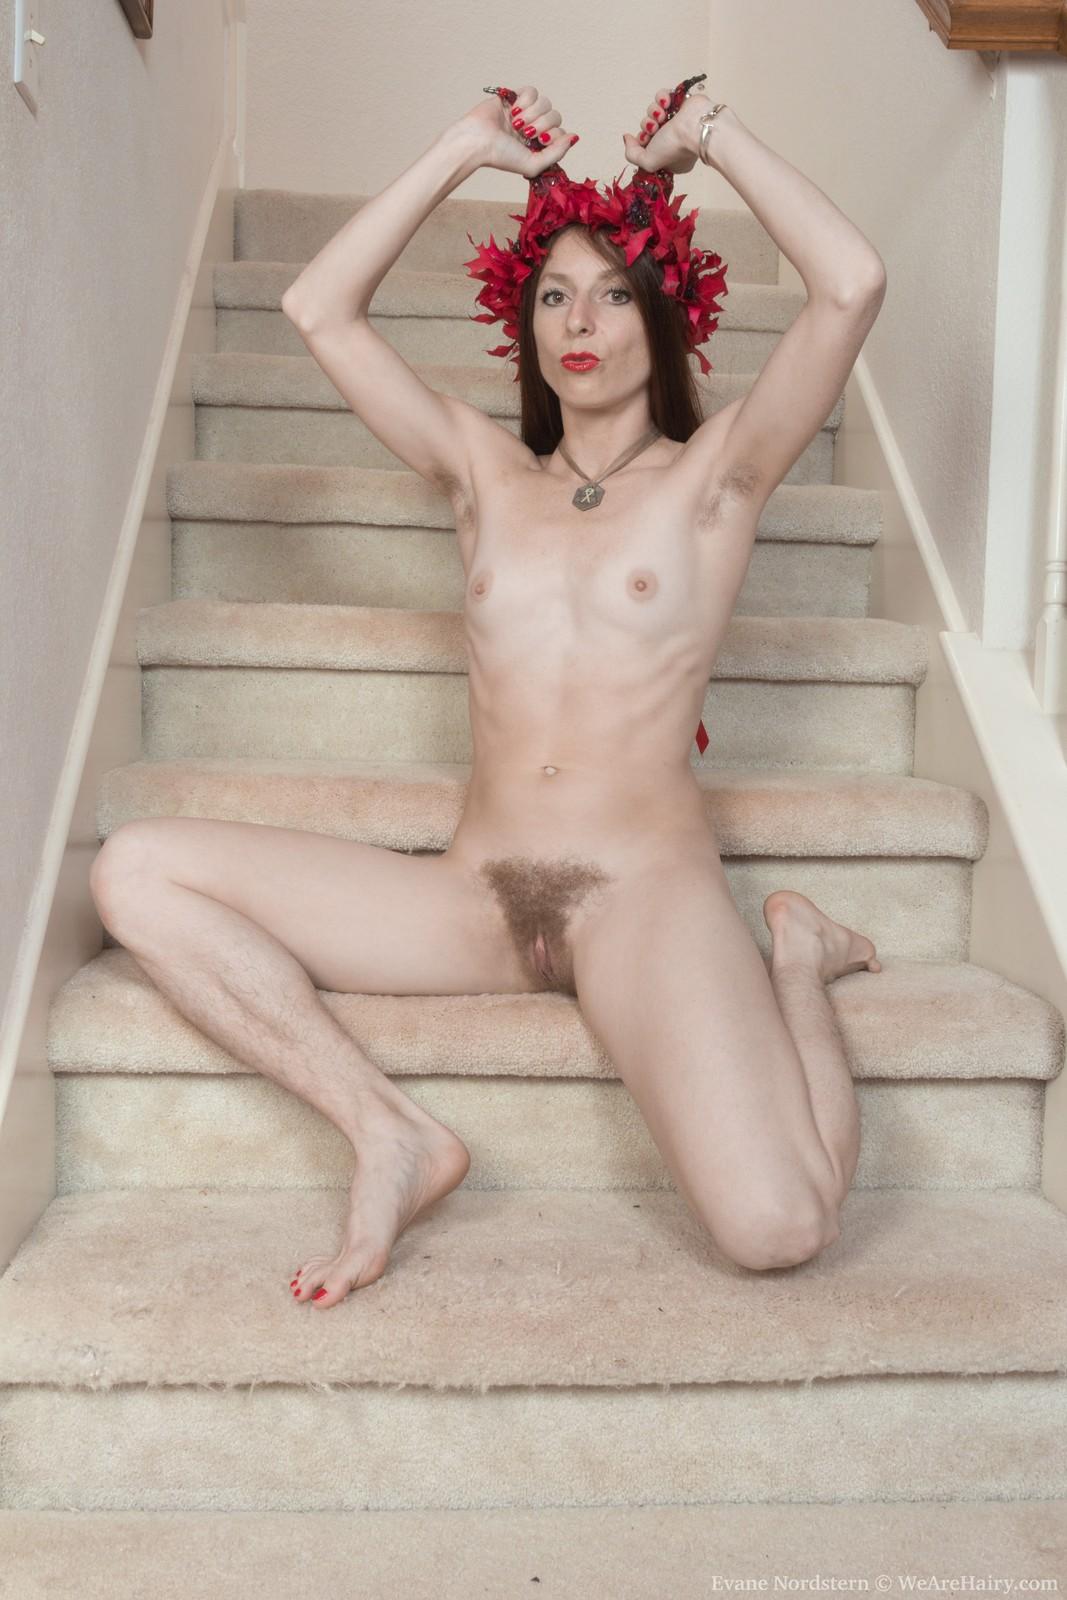 evane-nordstern-strips-naked-on-her-staircase13.jpg